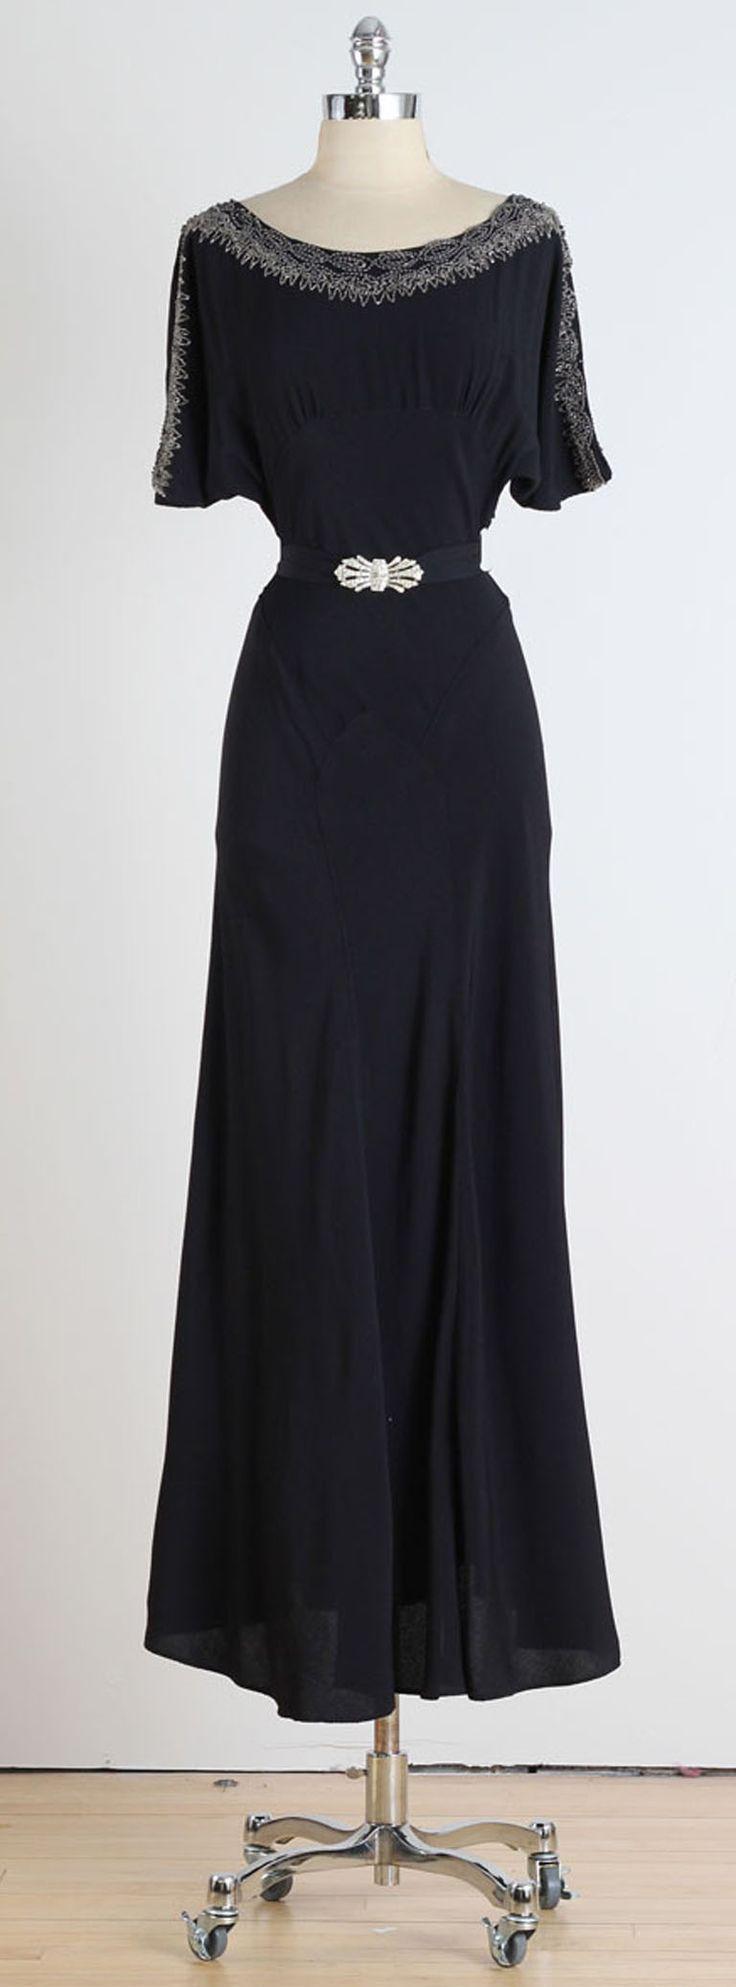 Black dress under graduation gown - Fairness Prom Dresses Prom Maxi Dress 2017 Uniors Dresses 2018